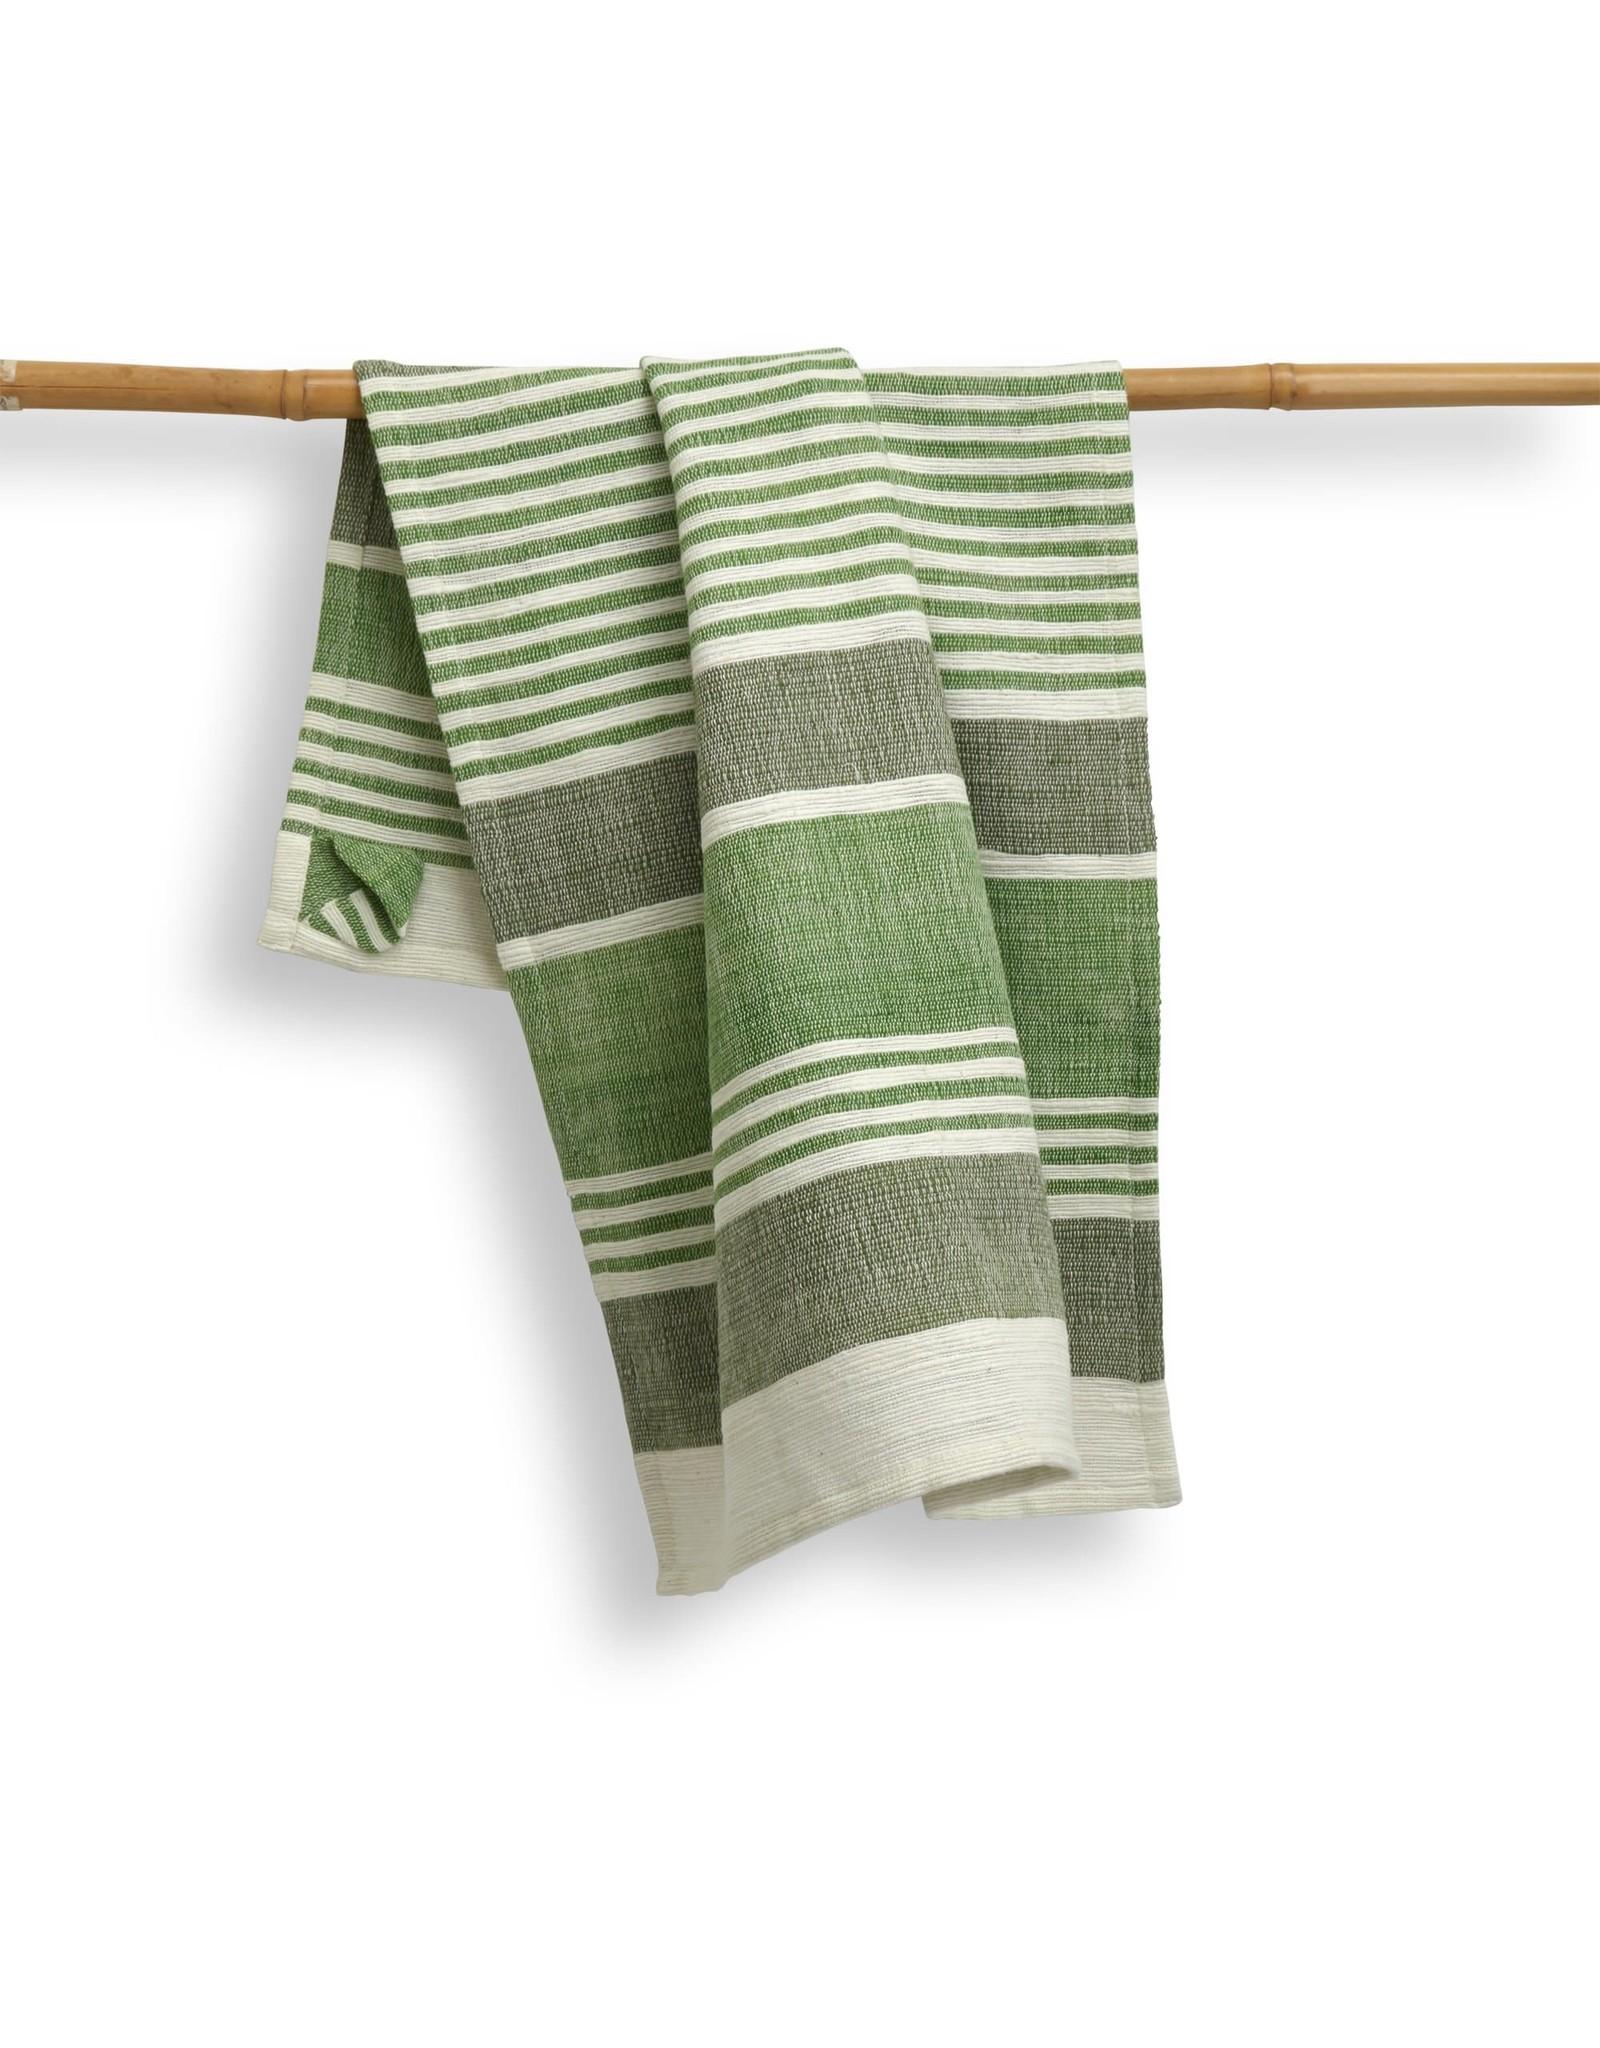 India, 27 x 19 Cotton Handwoven Kitchen Towels Fern